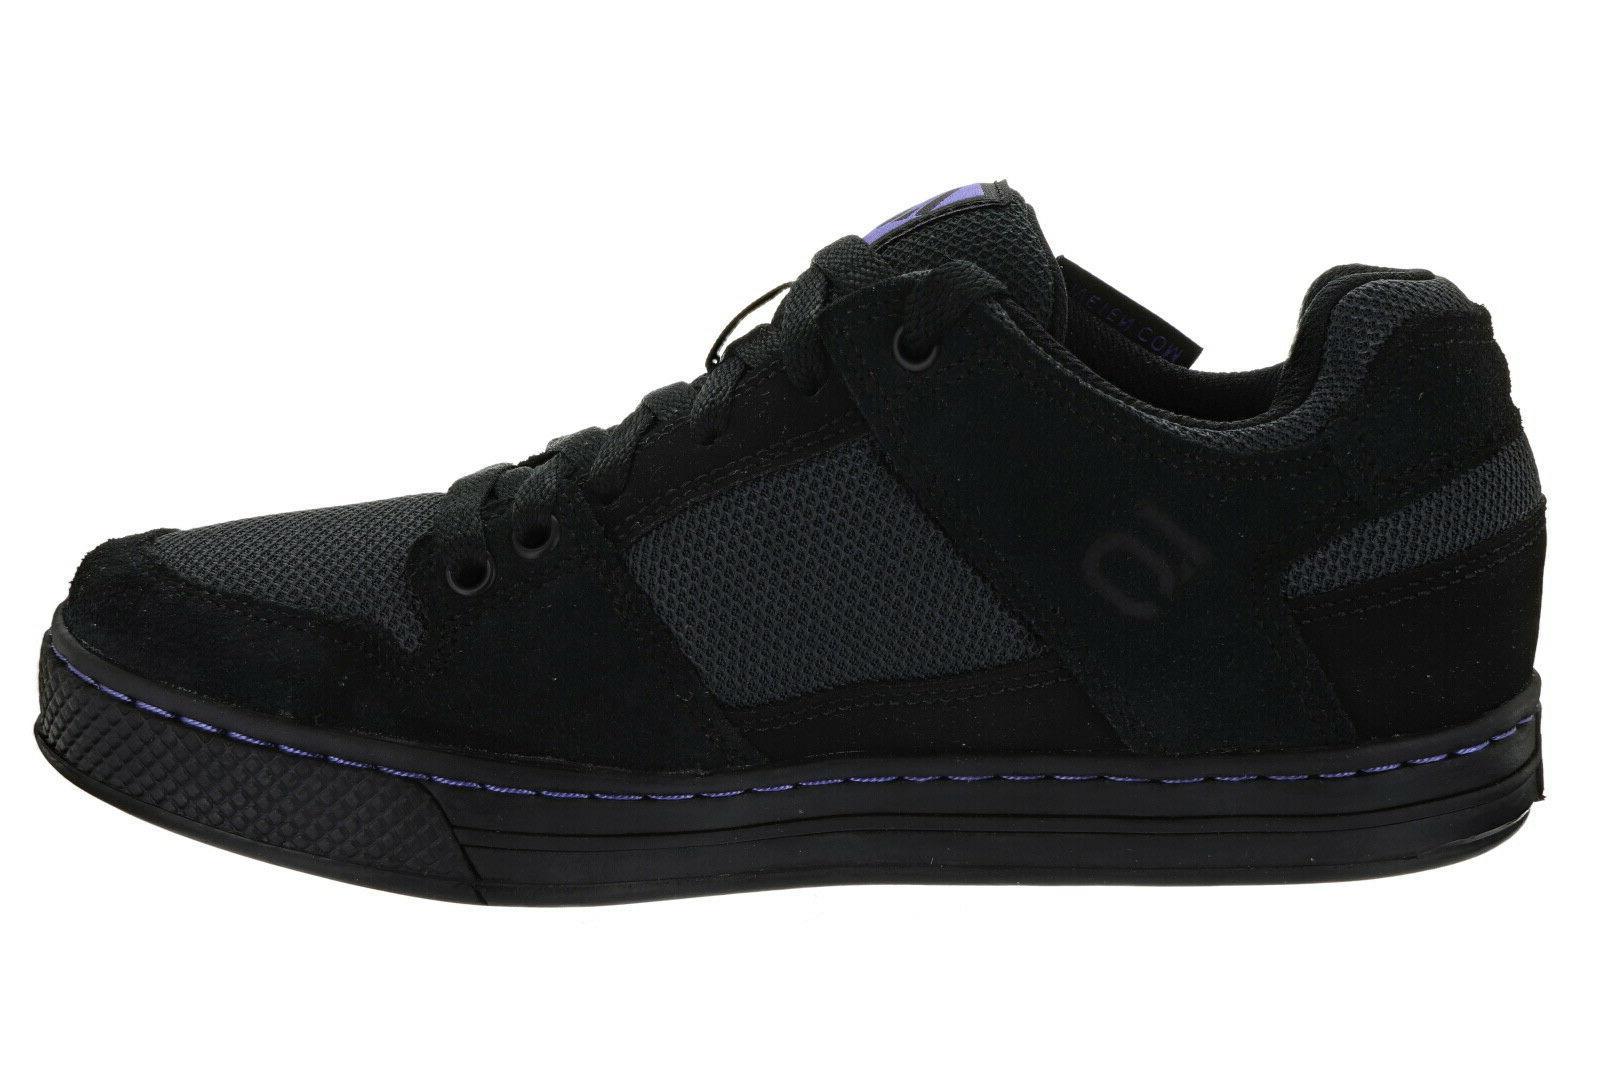 Five Freerider Adidas Size Athletic 5314